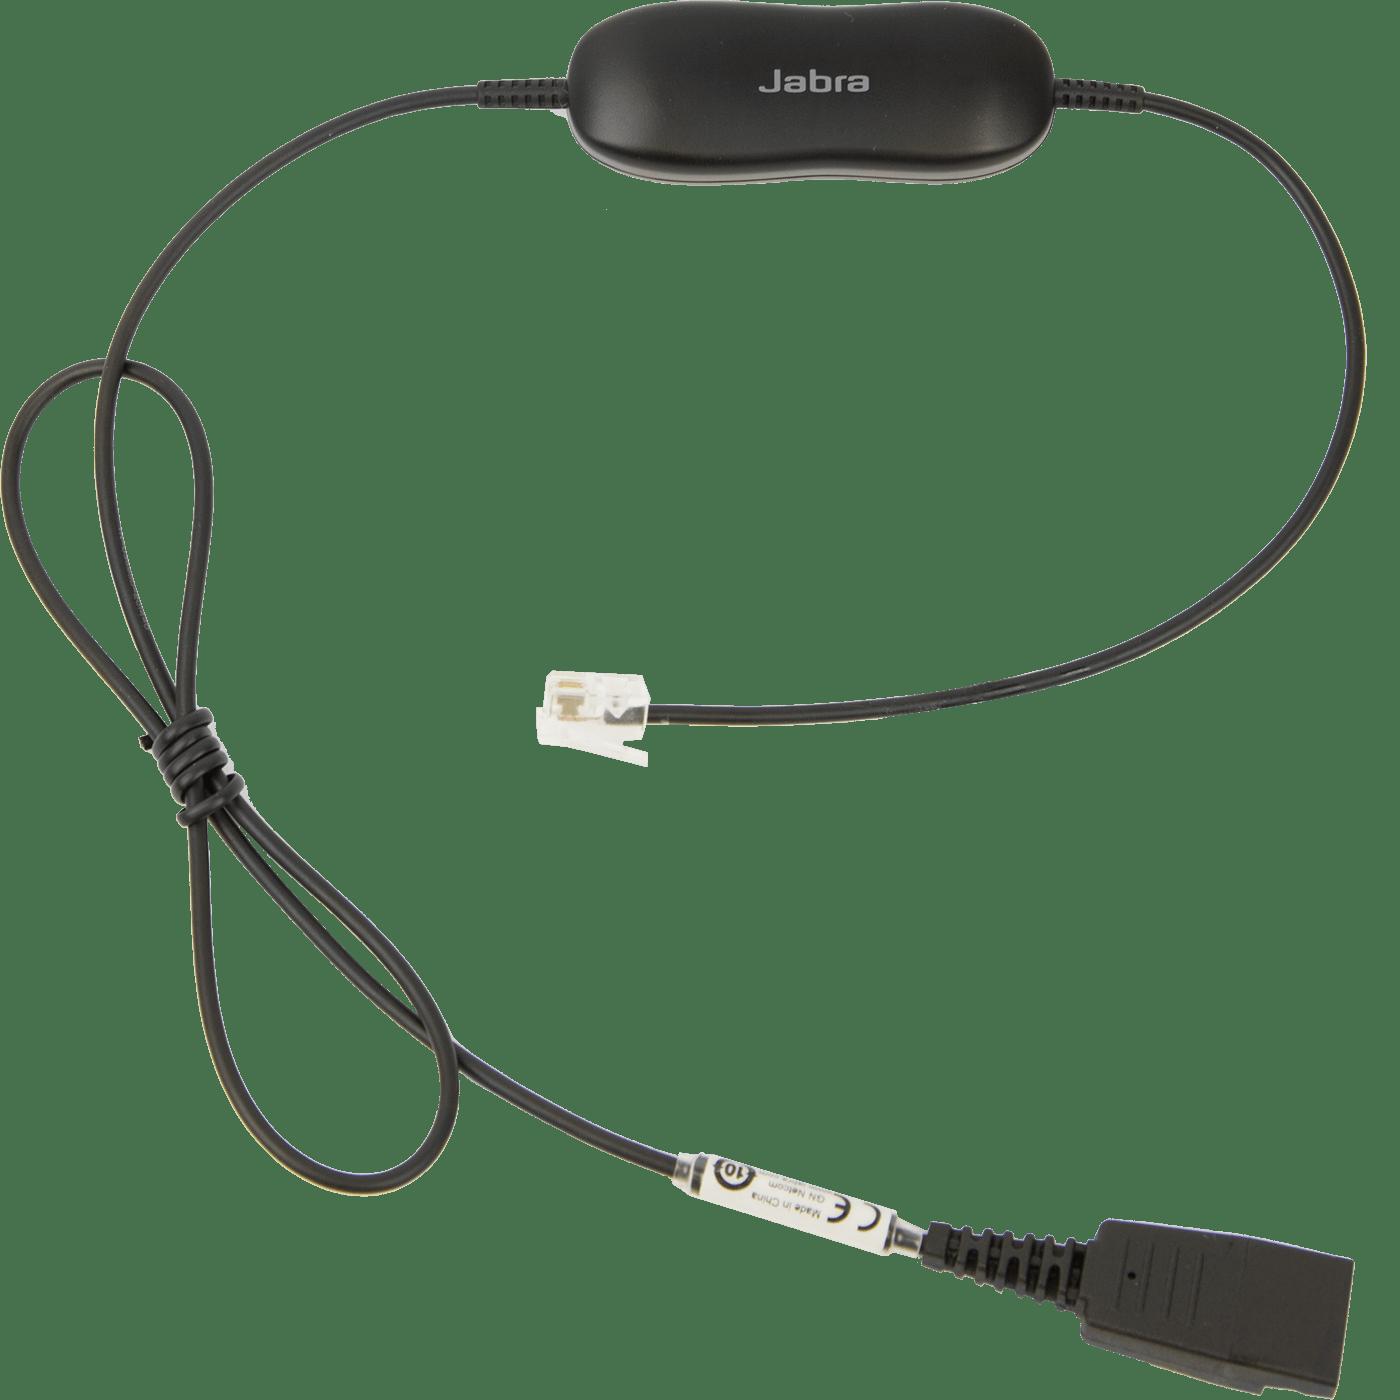 Accesorios Cable GN Jabra 1216 para Avaya